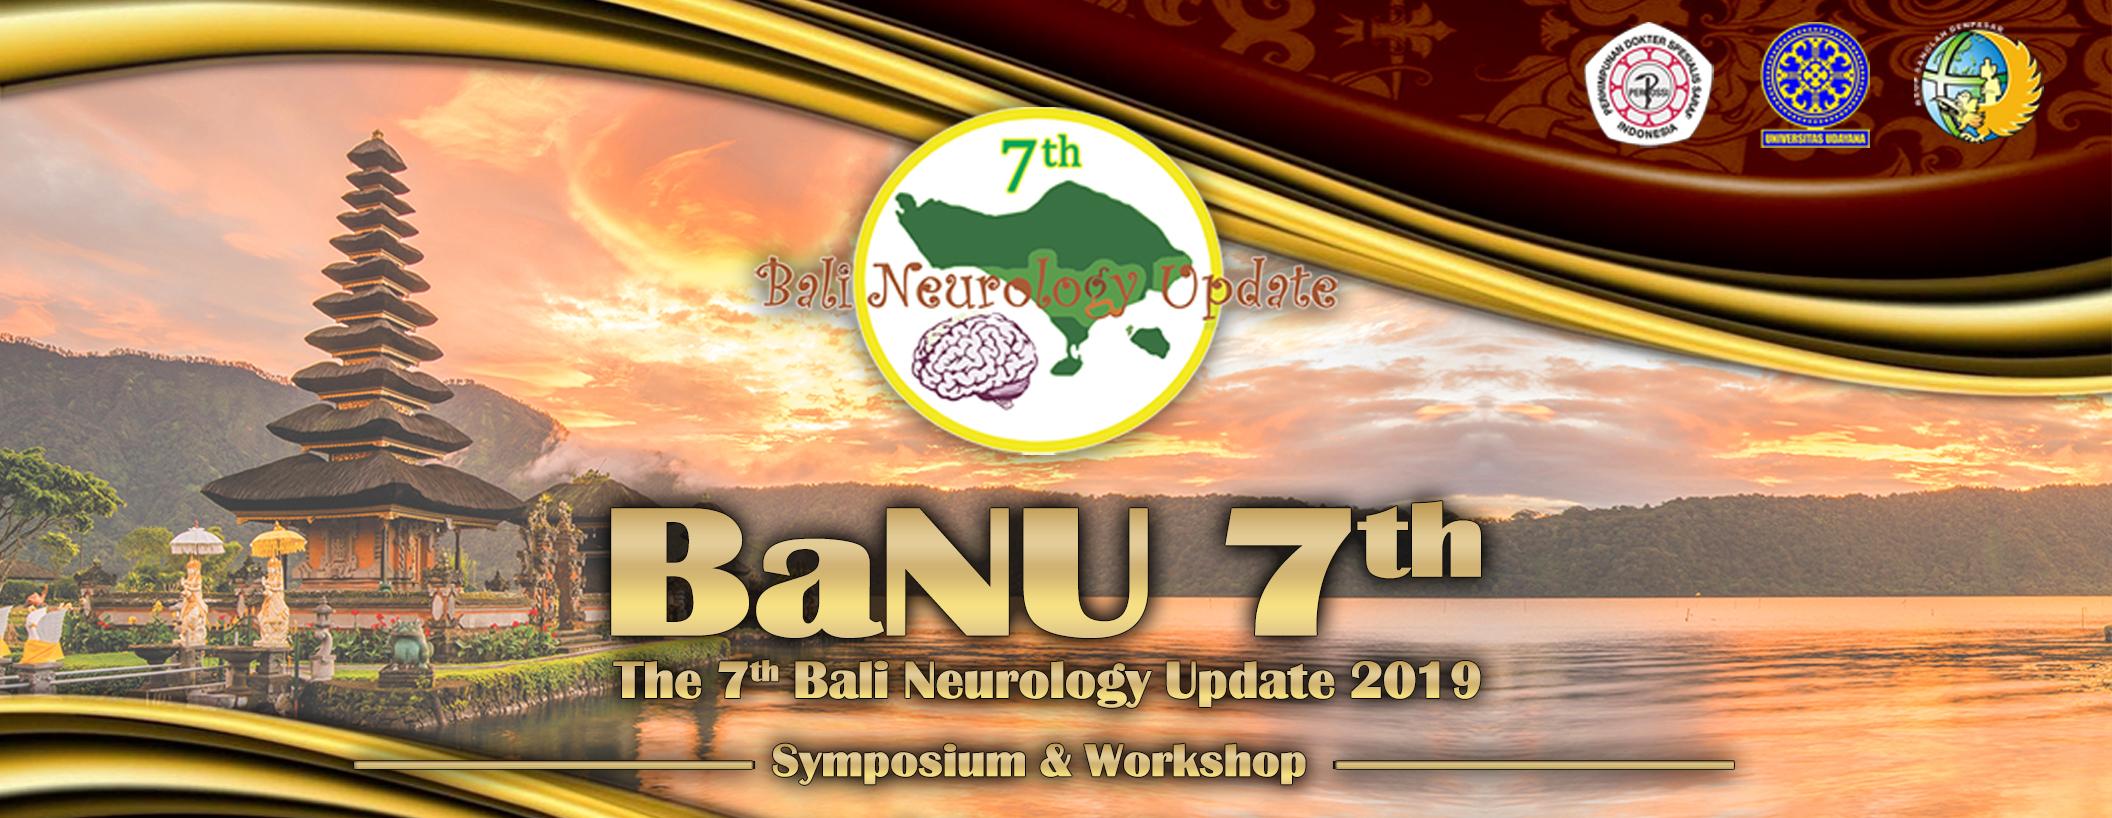 Penyelenggaraan Bali Neurology Update (BaNU) 7th